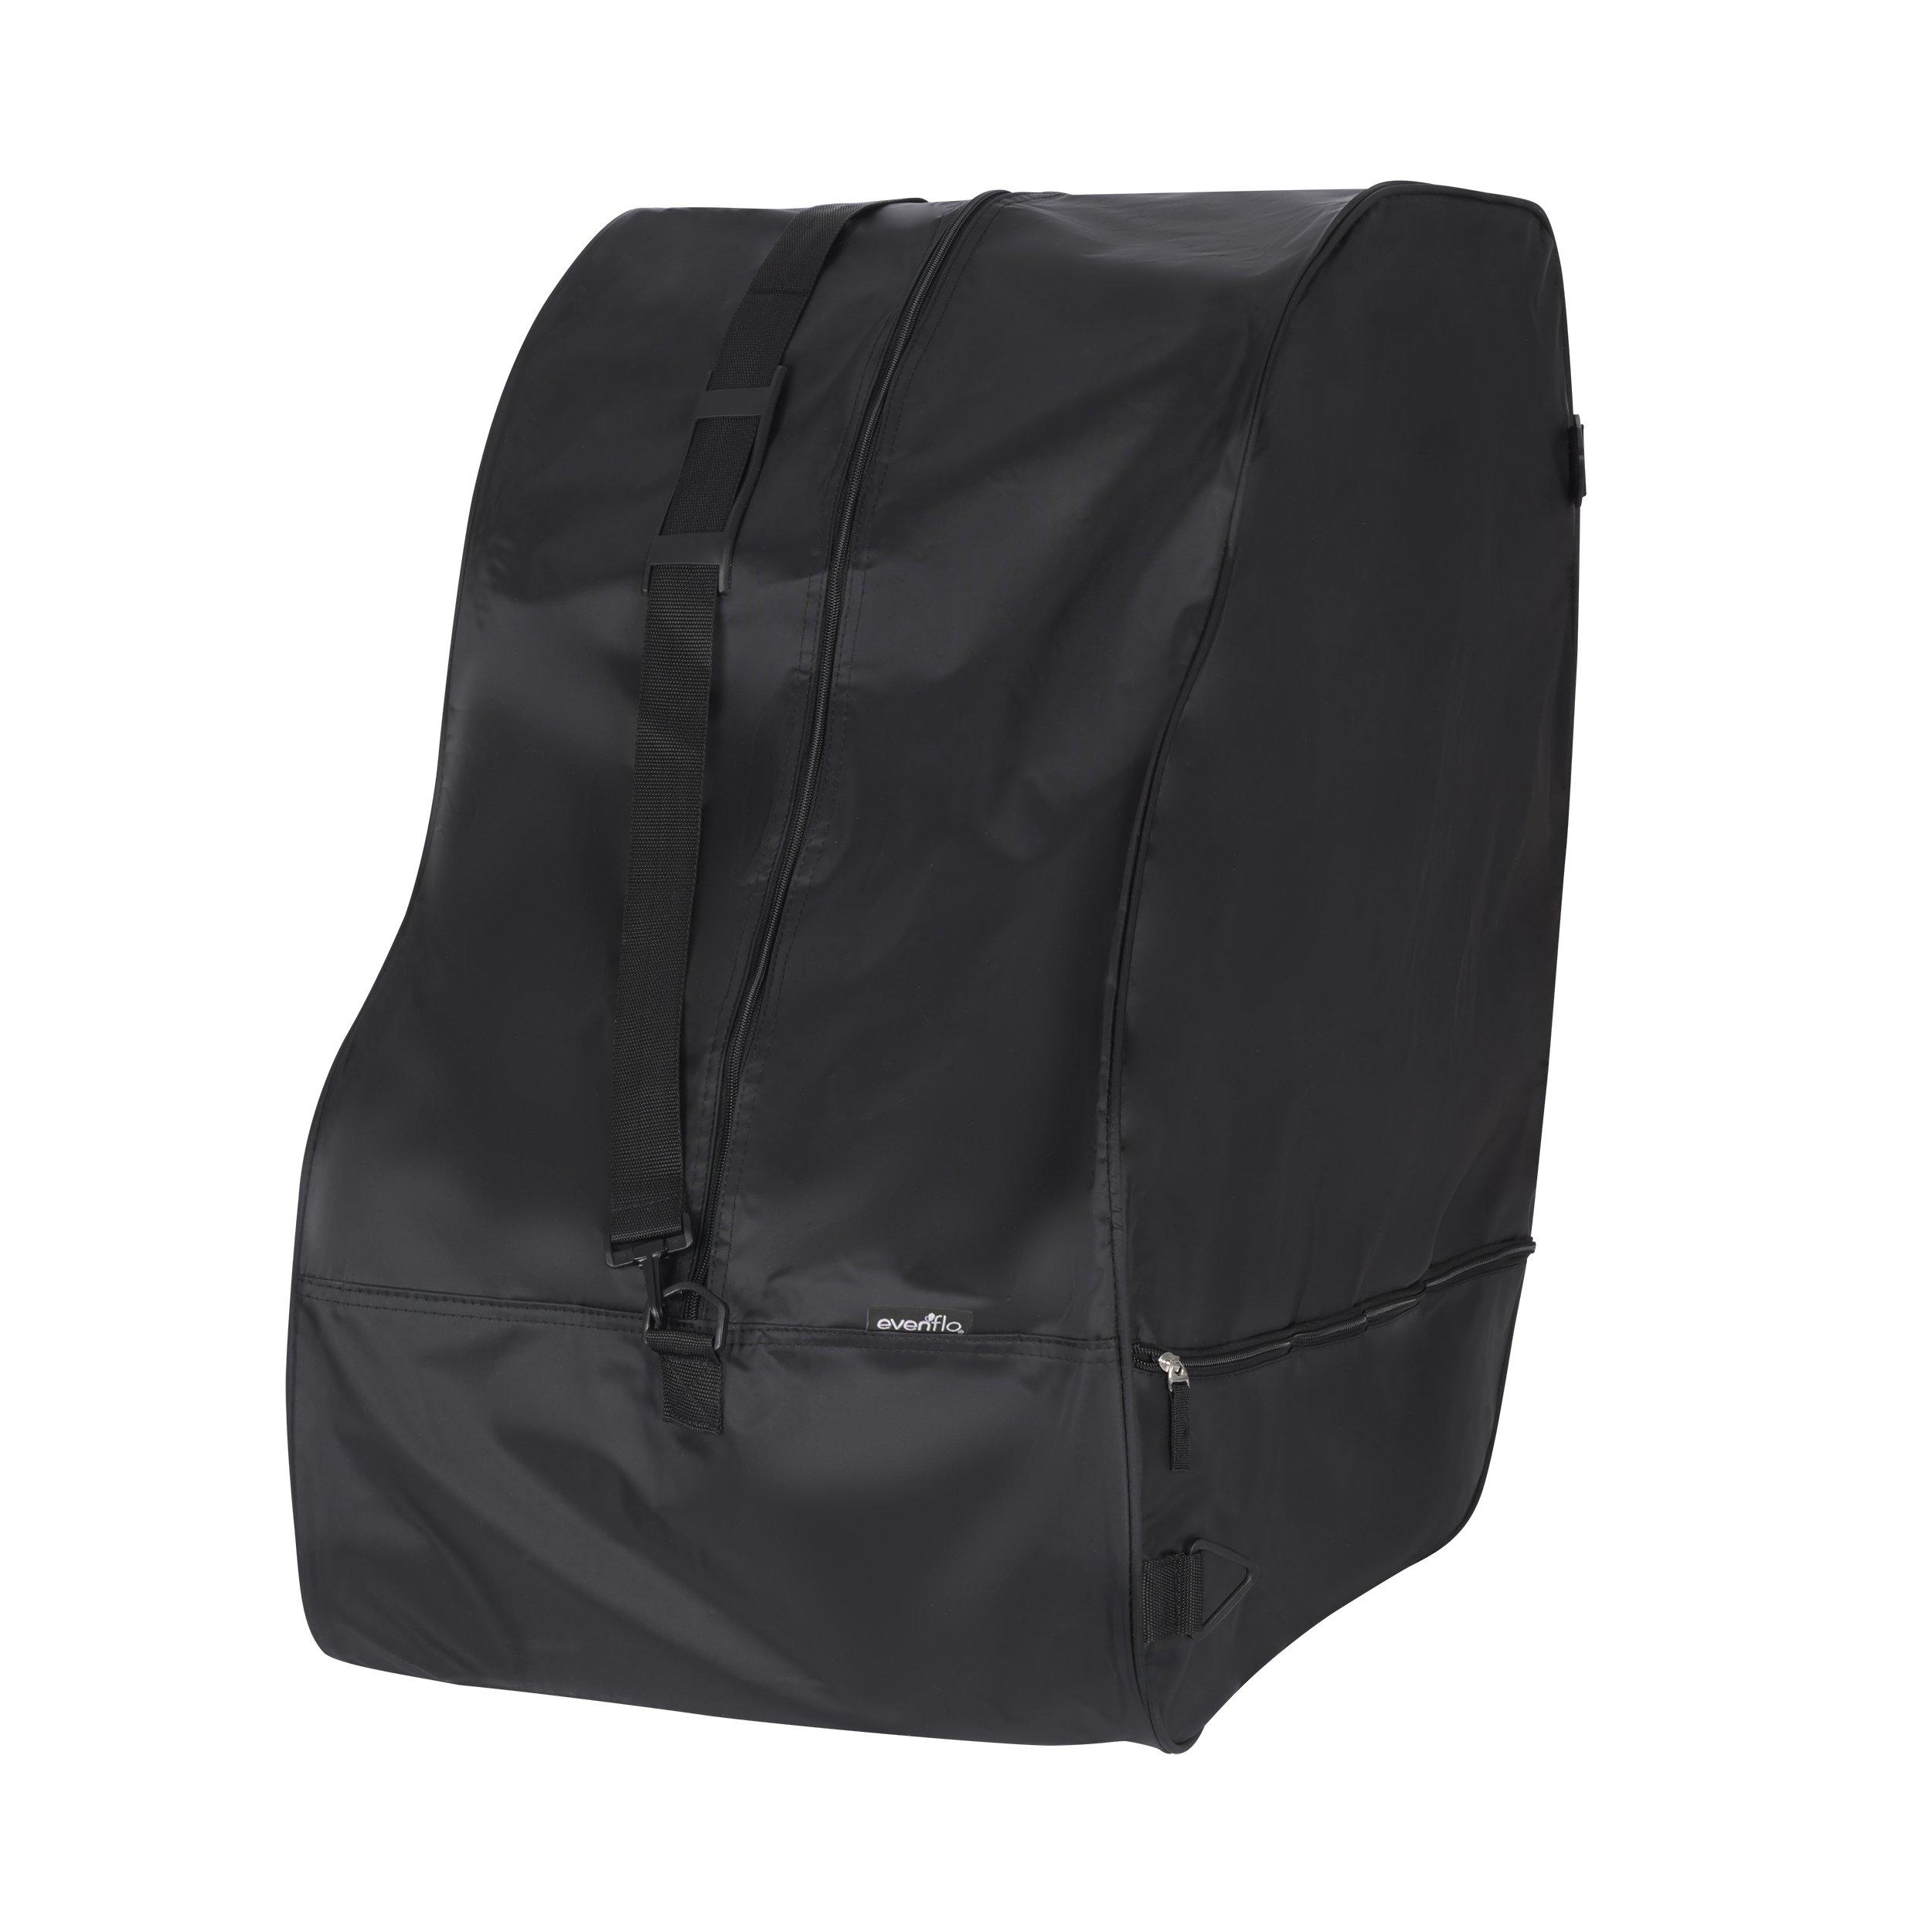 Evenflo Car Seat Travel & Storage Bag